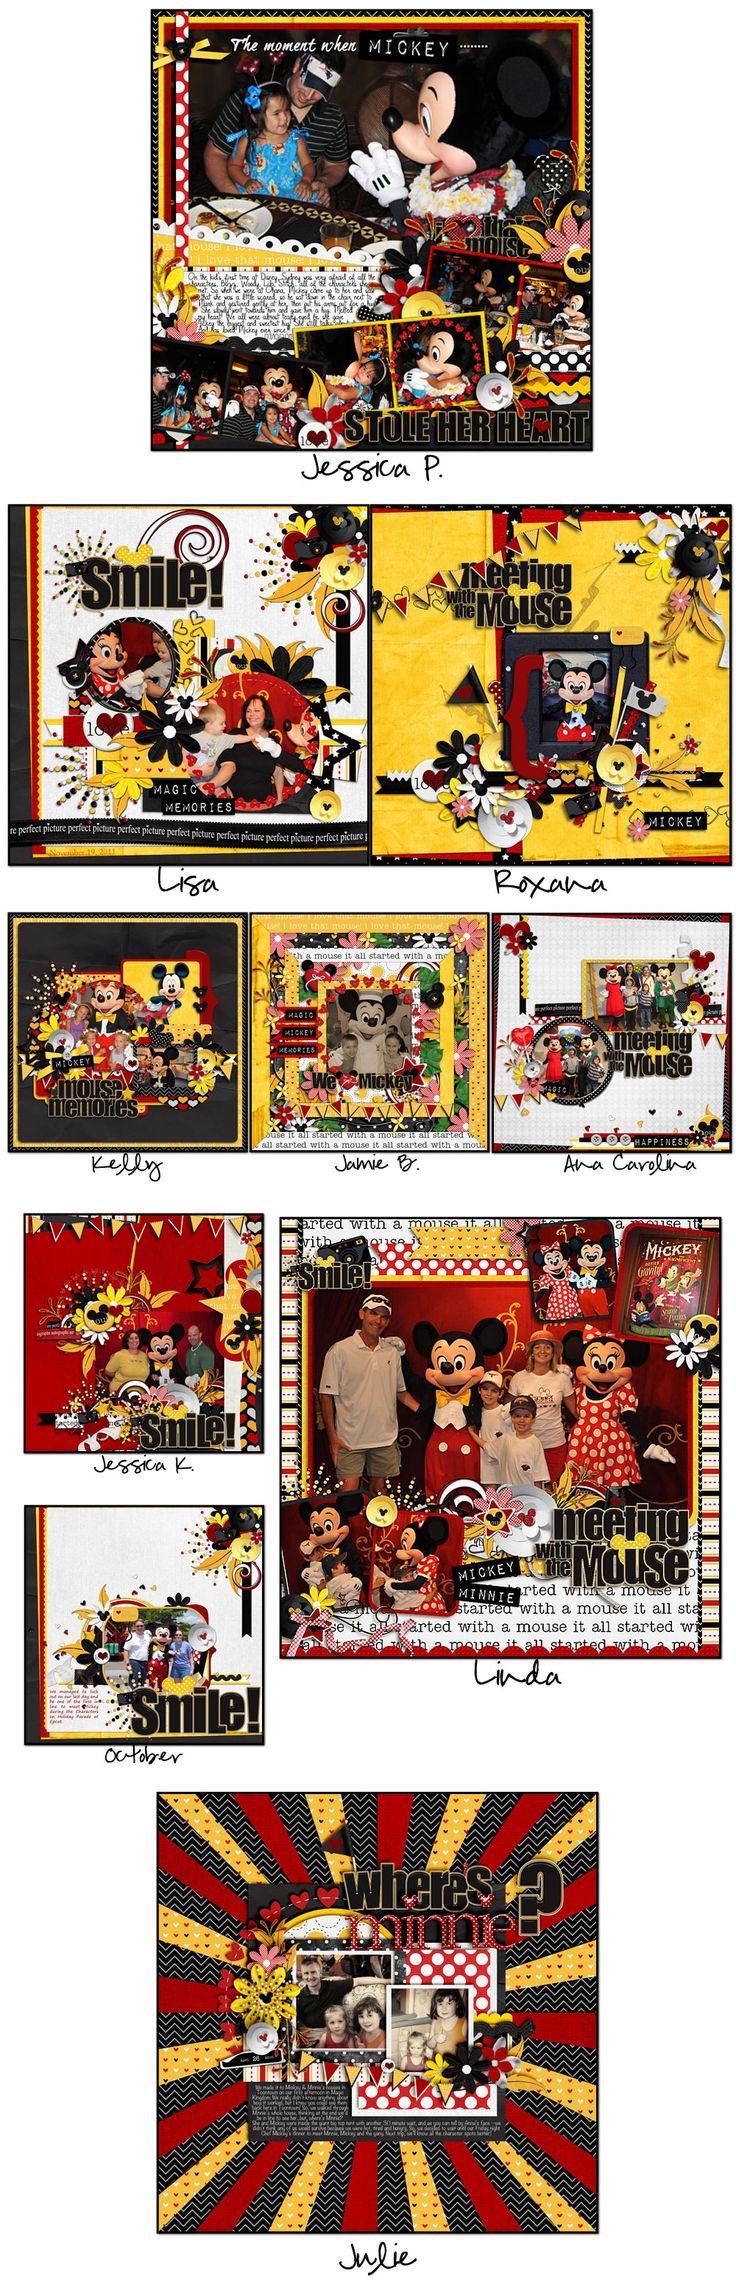 Disney scrapbook ideas - Disney Scrapbooking